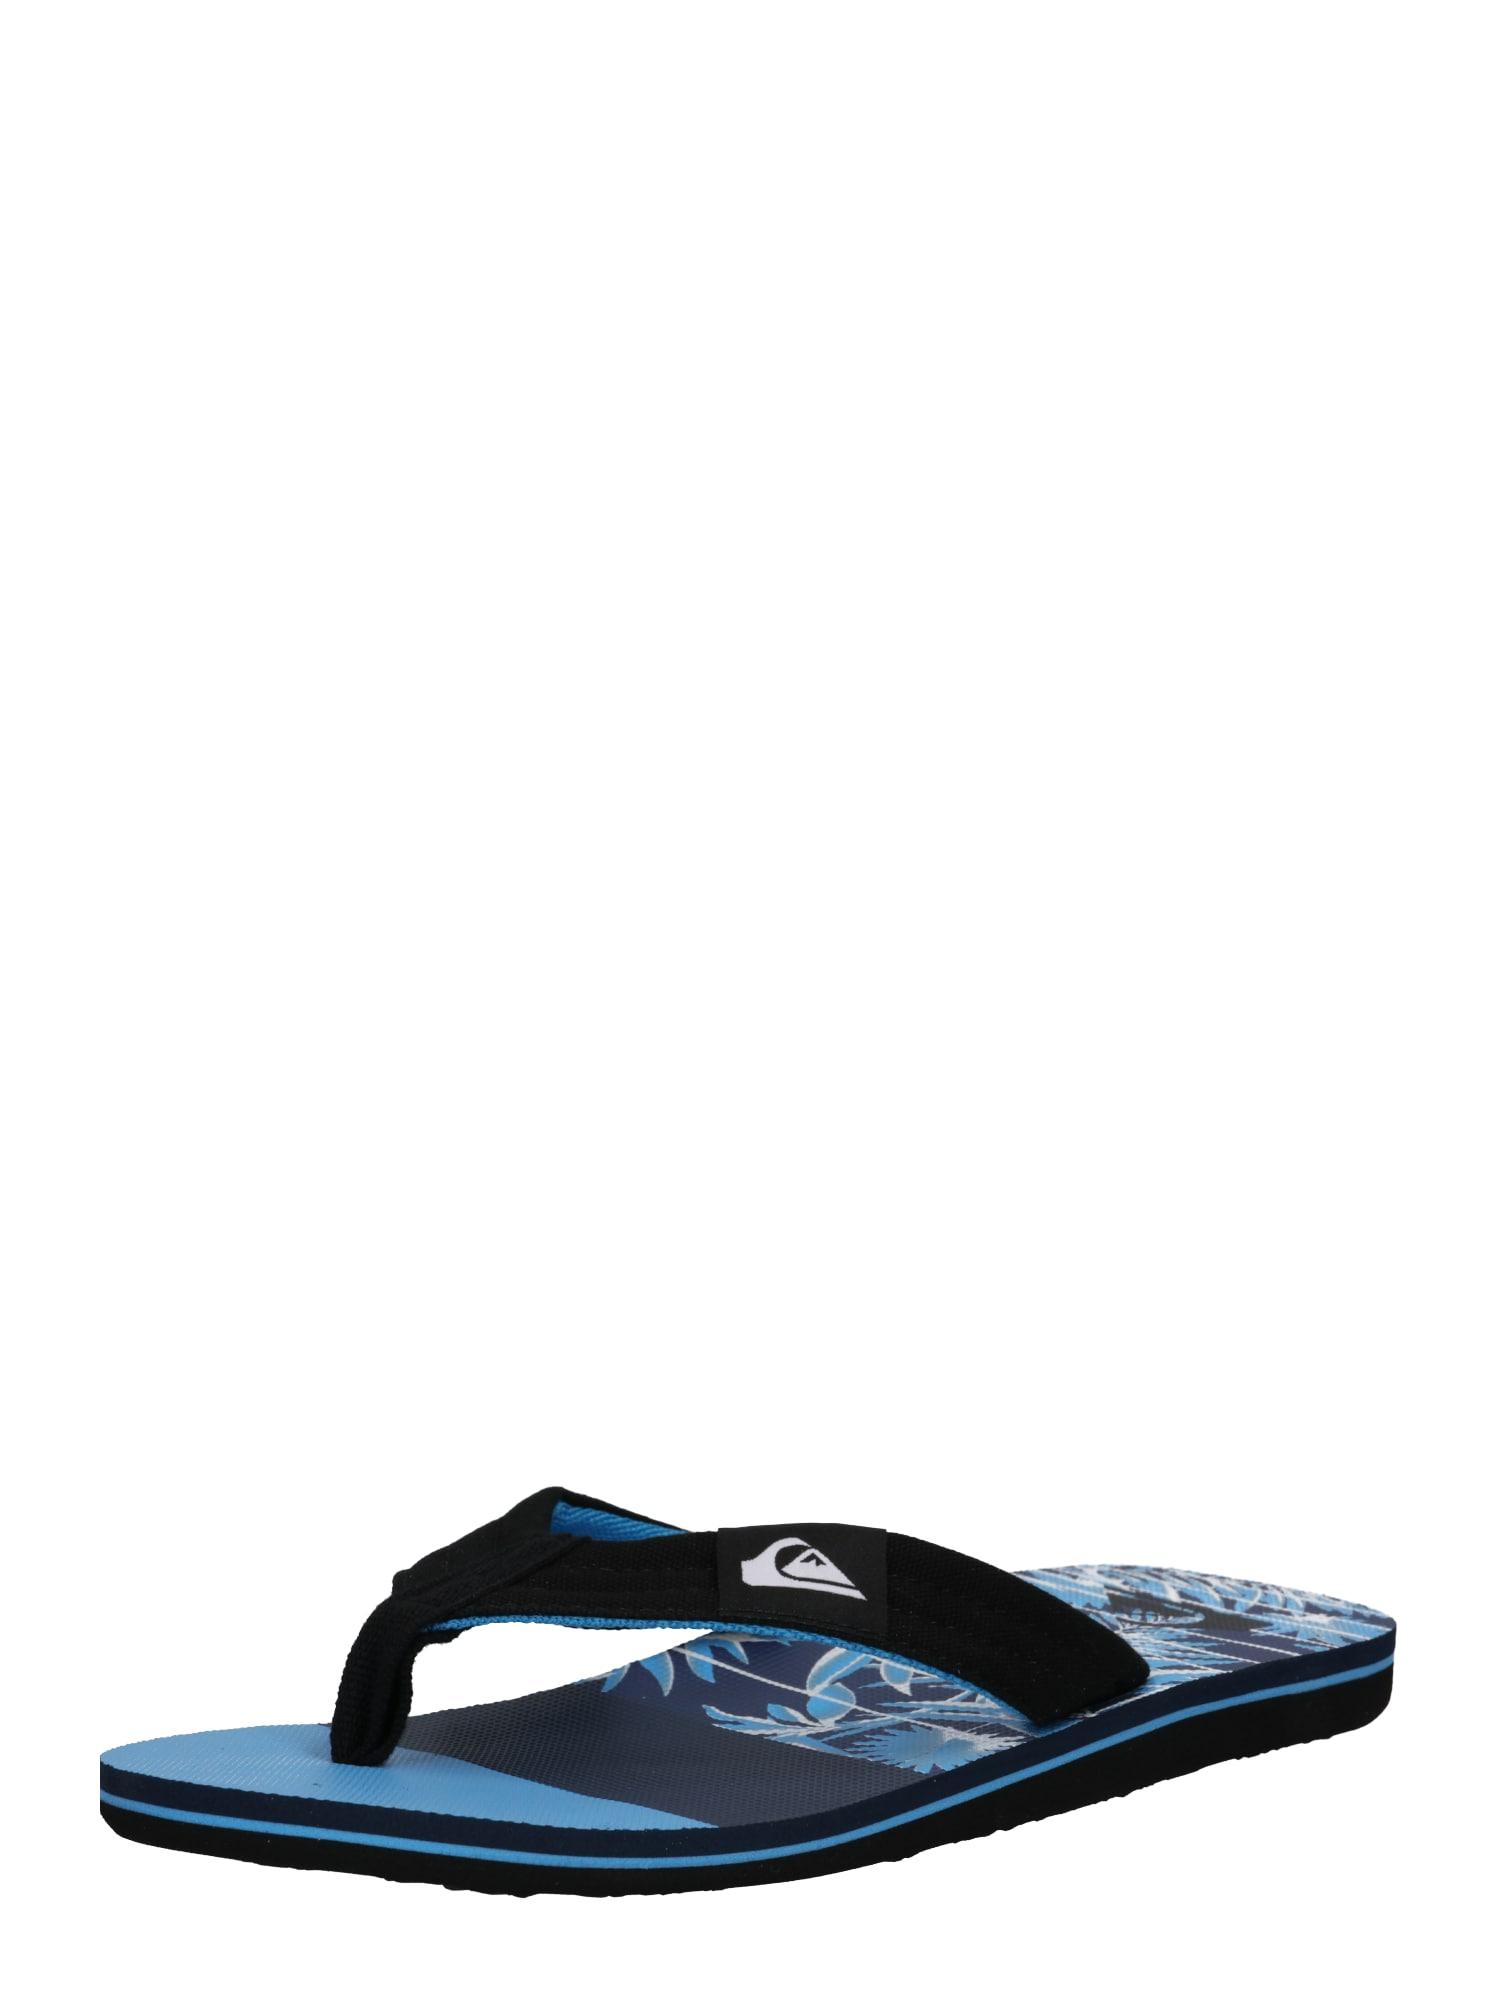 Žabky MOLOKAI modrá černá QUIKSILVER